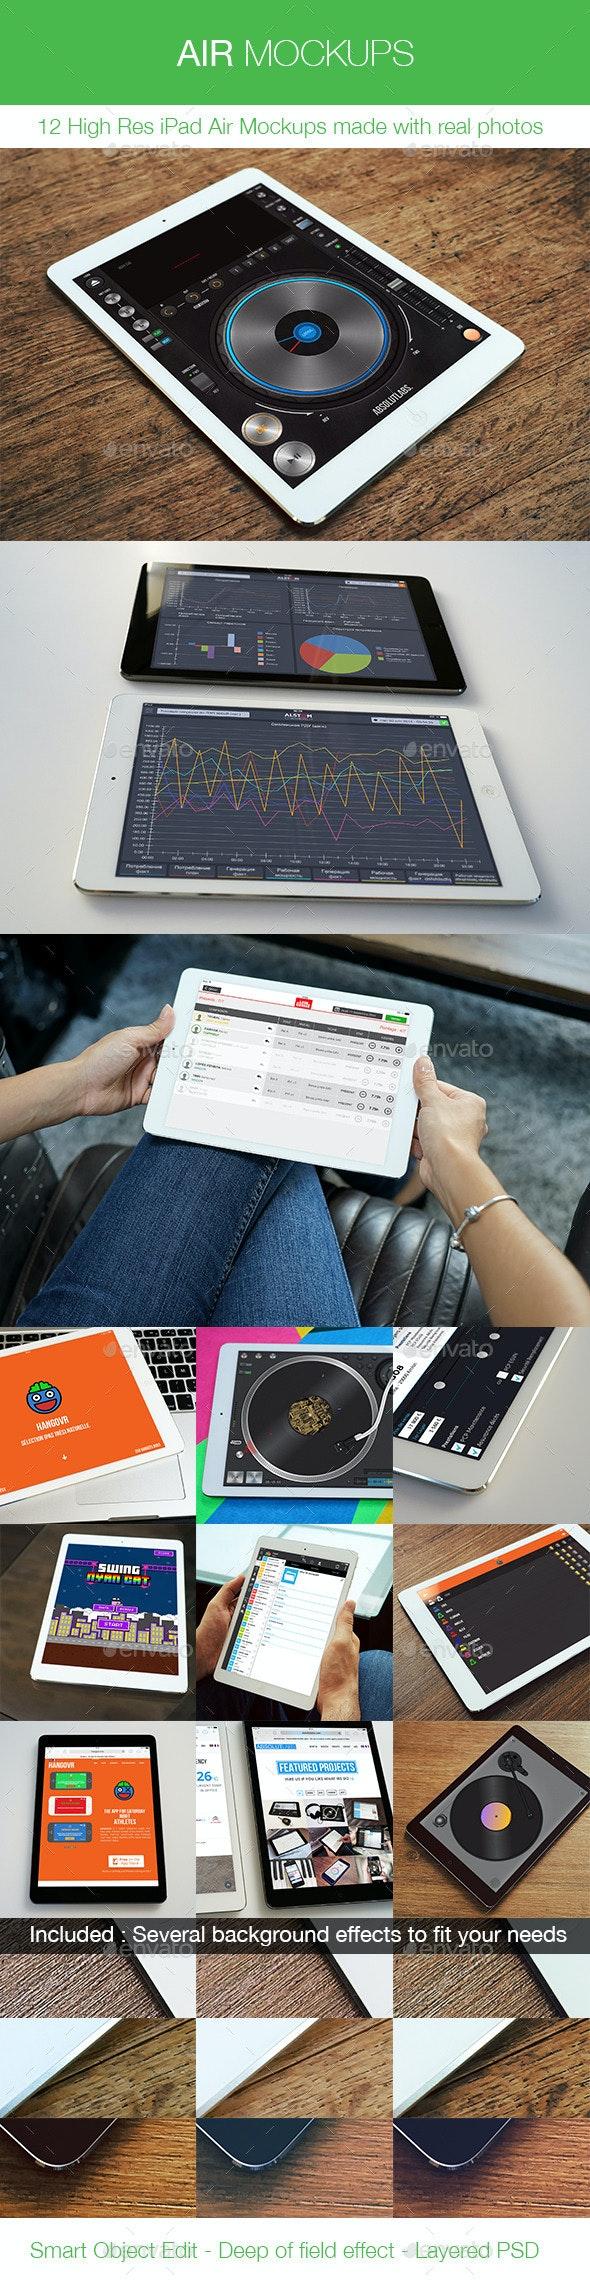 Air Mockups - 12 iPad Air Real Photos Mockups - Mobile Displays